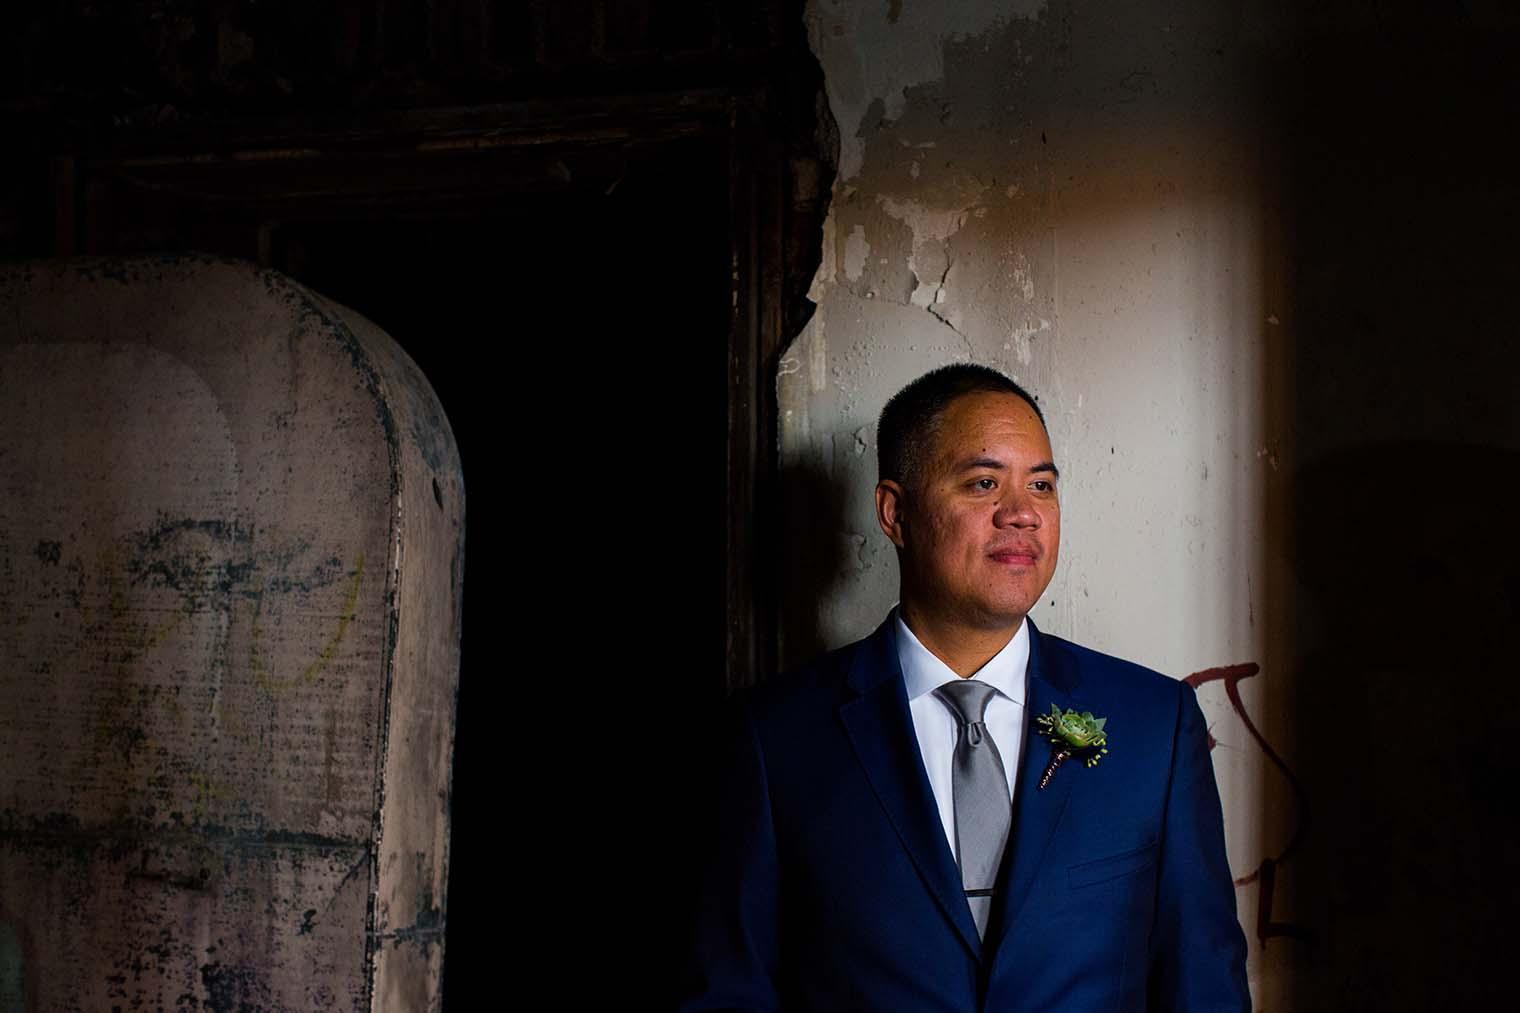 16th Street Station Wedding Portrait of Groom